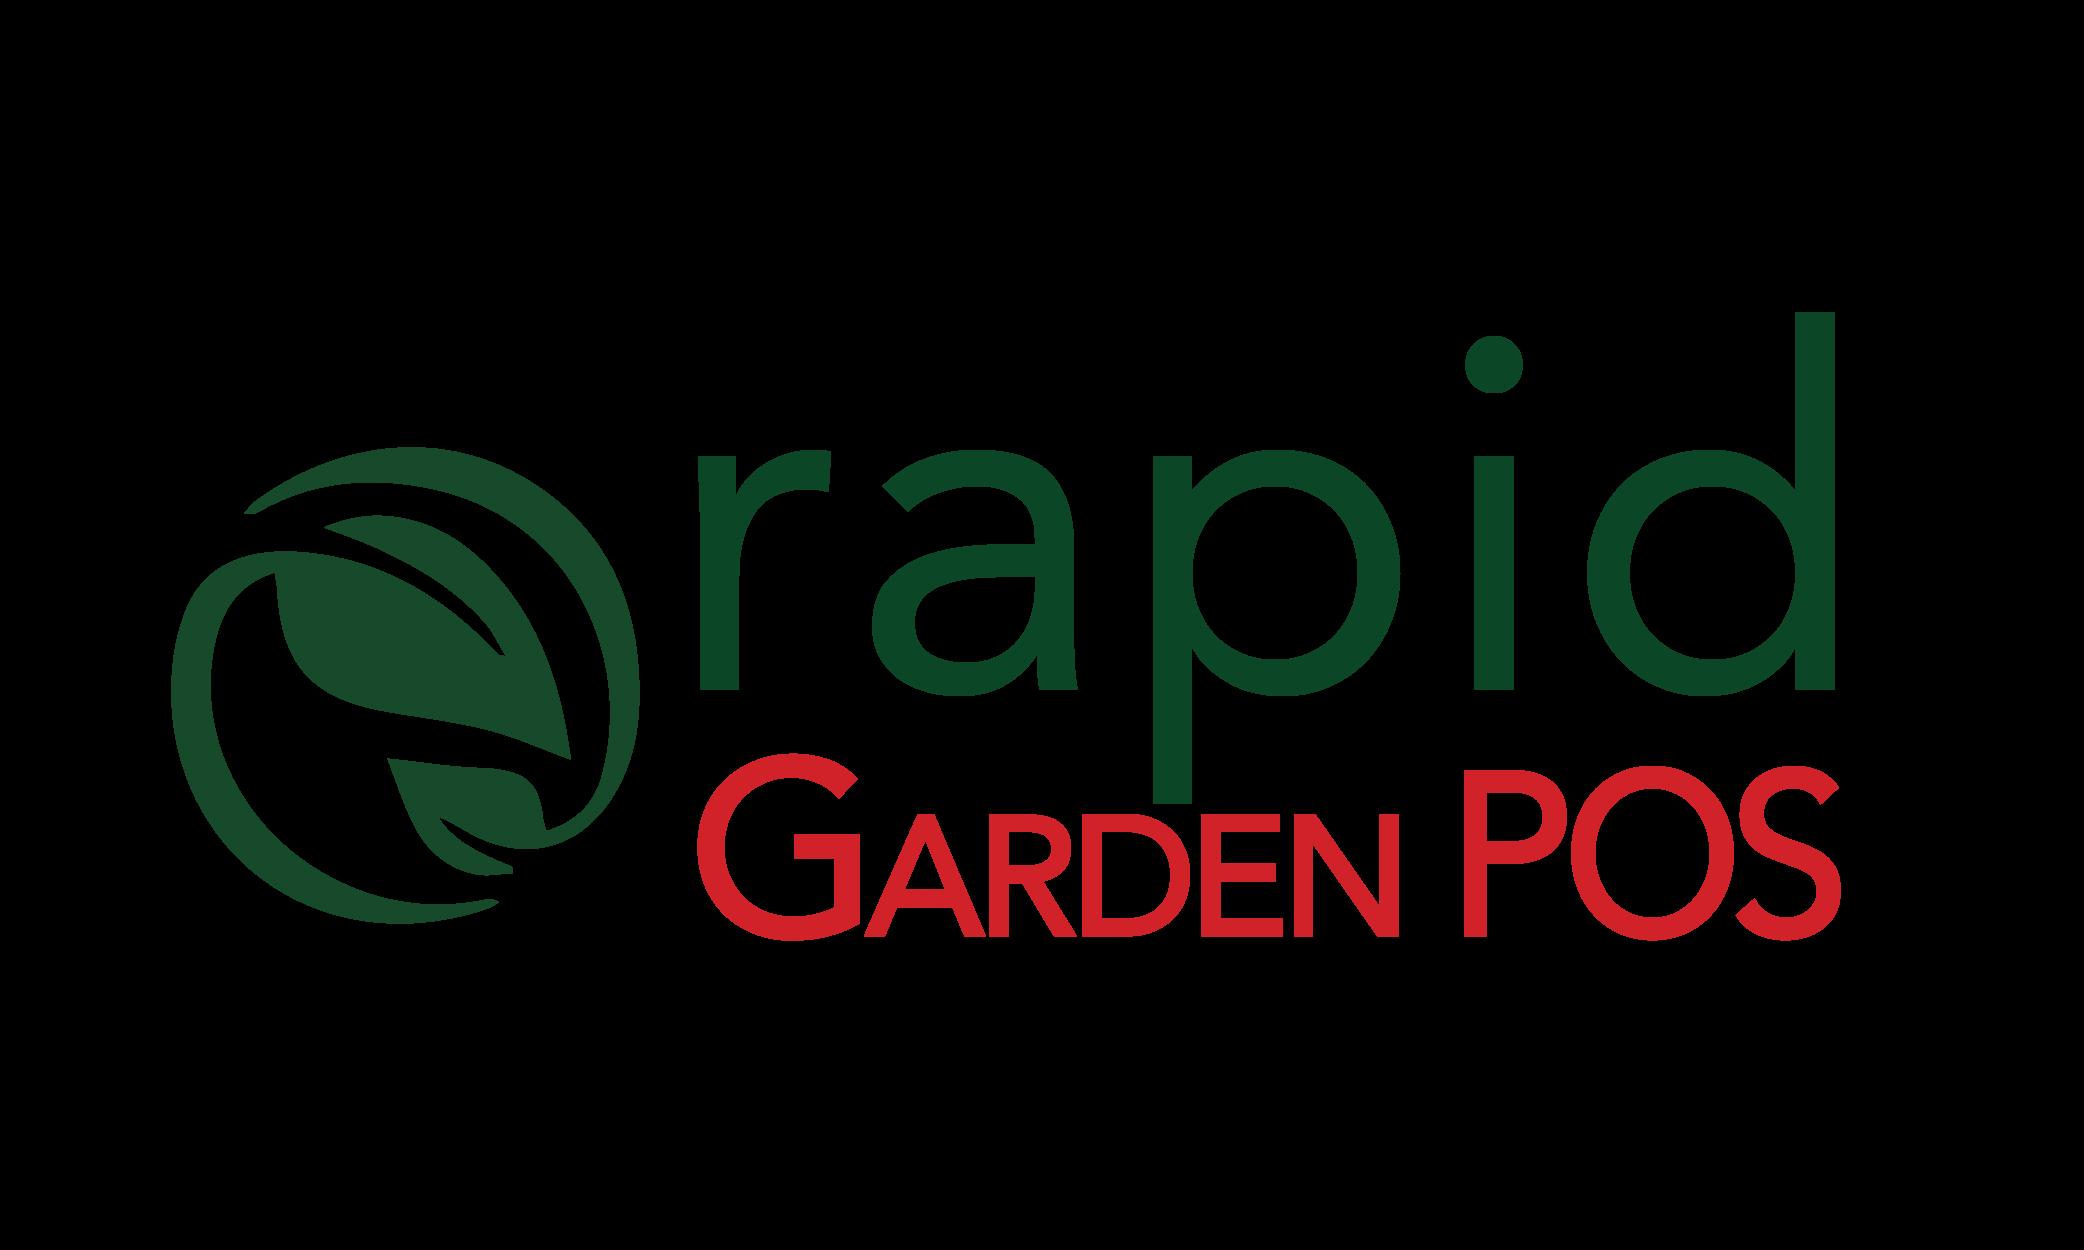 Landscape Management Software | Rapid Garden POS